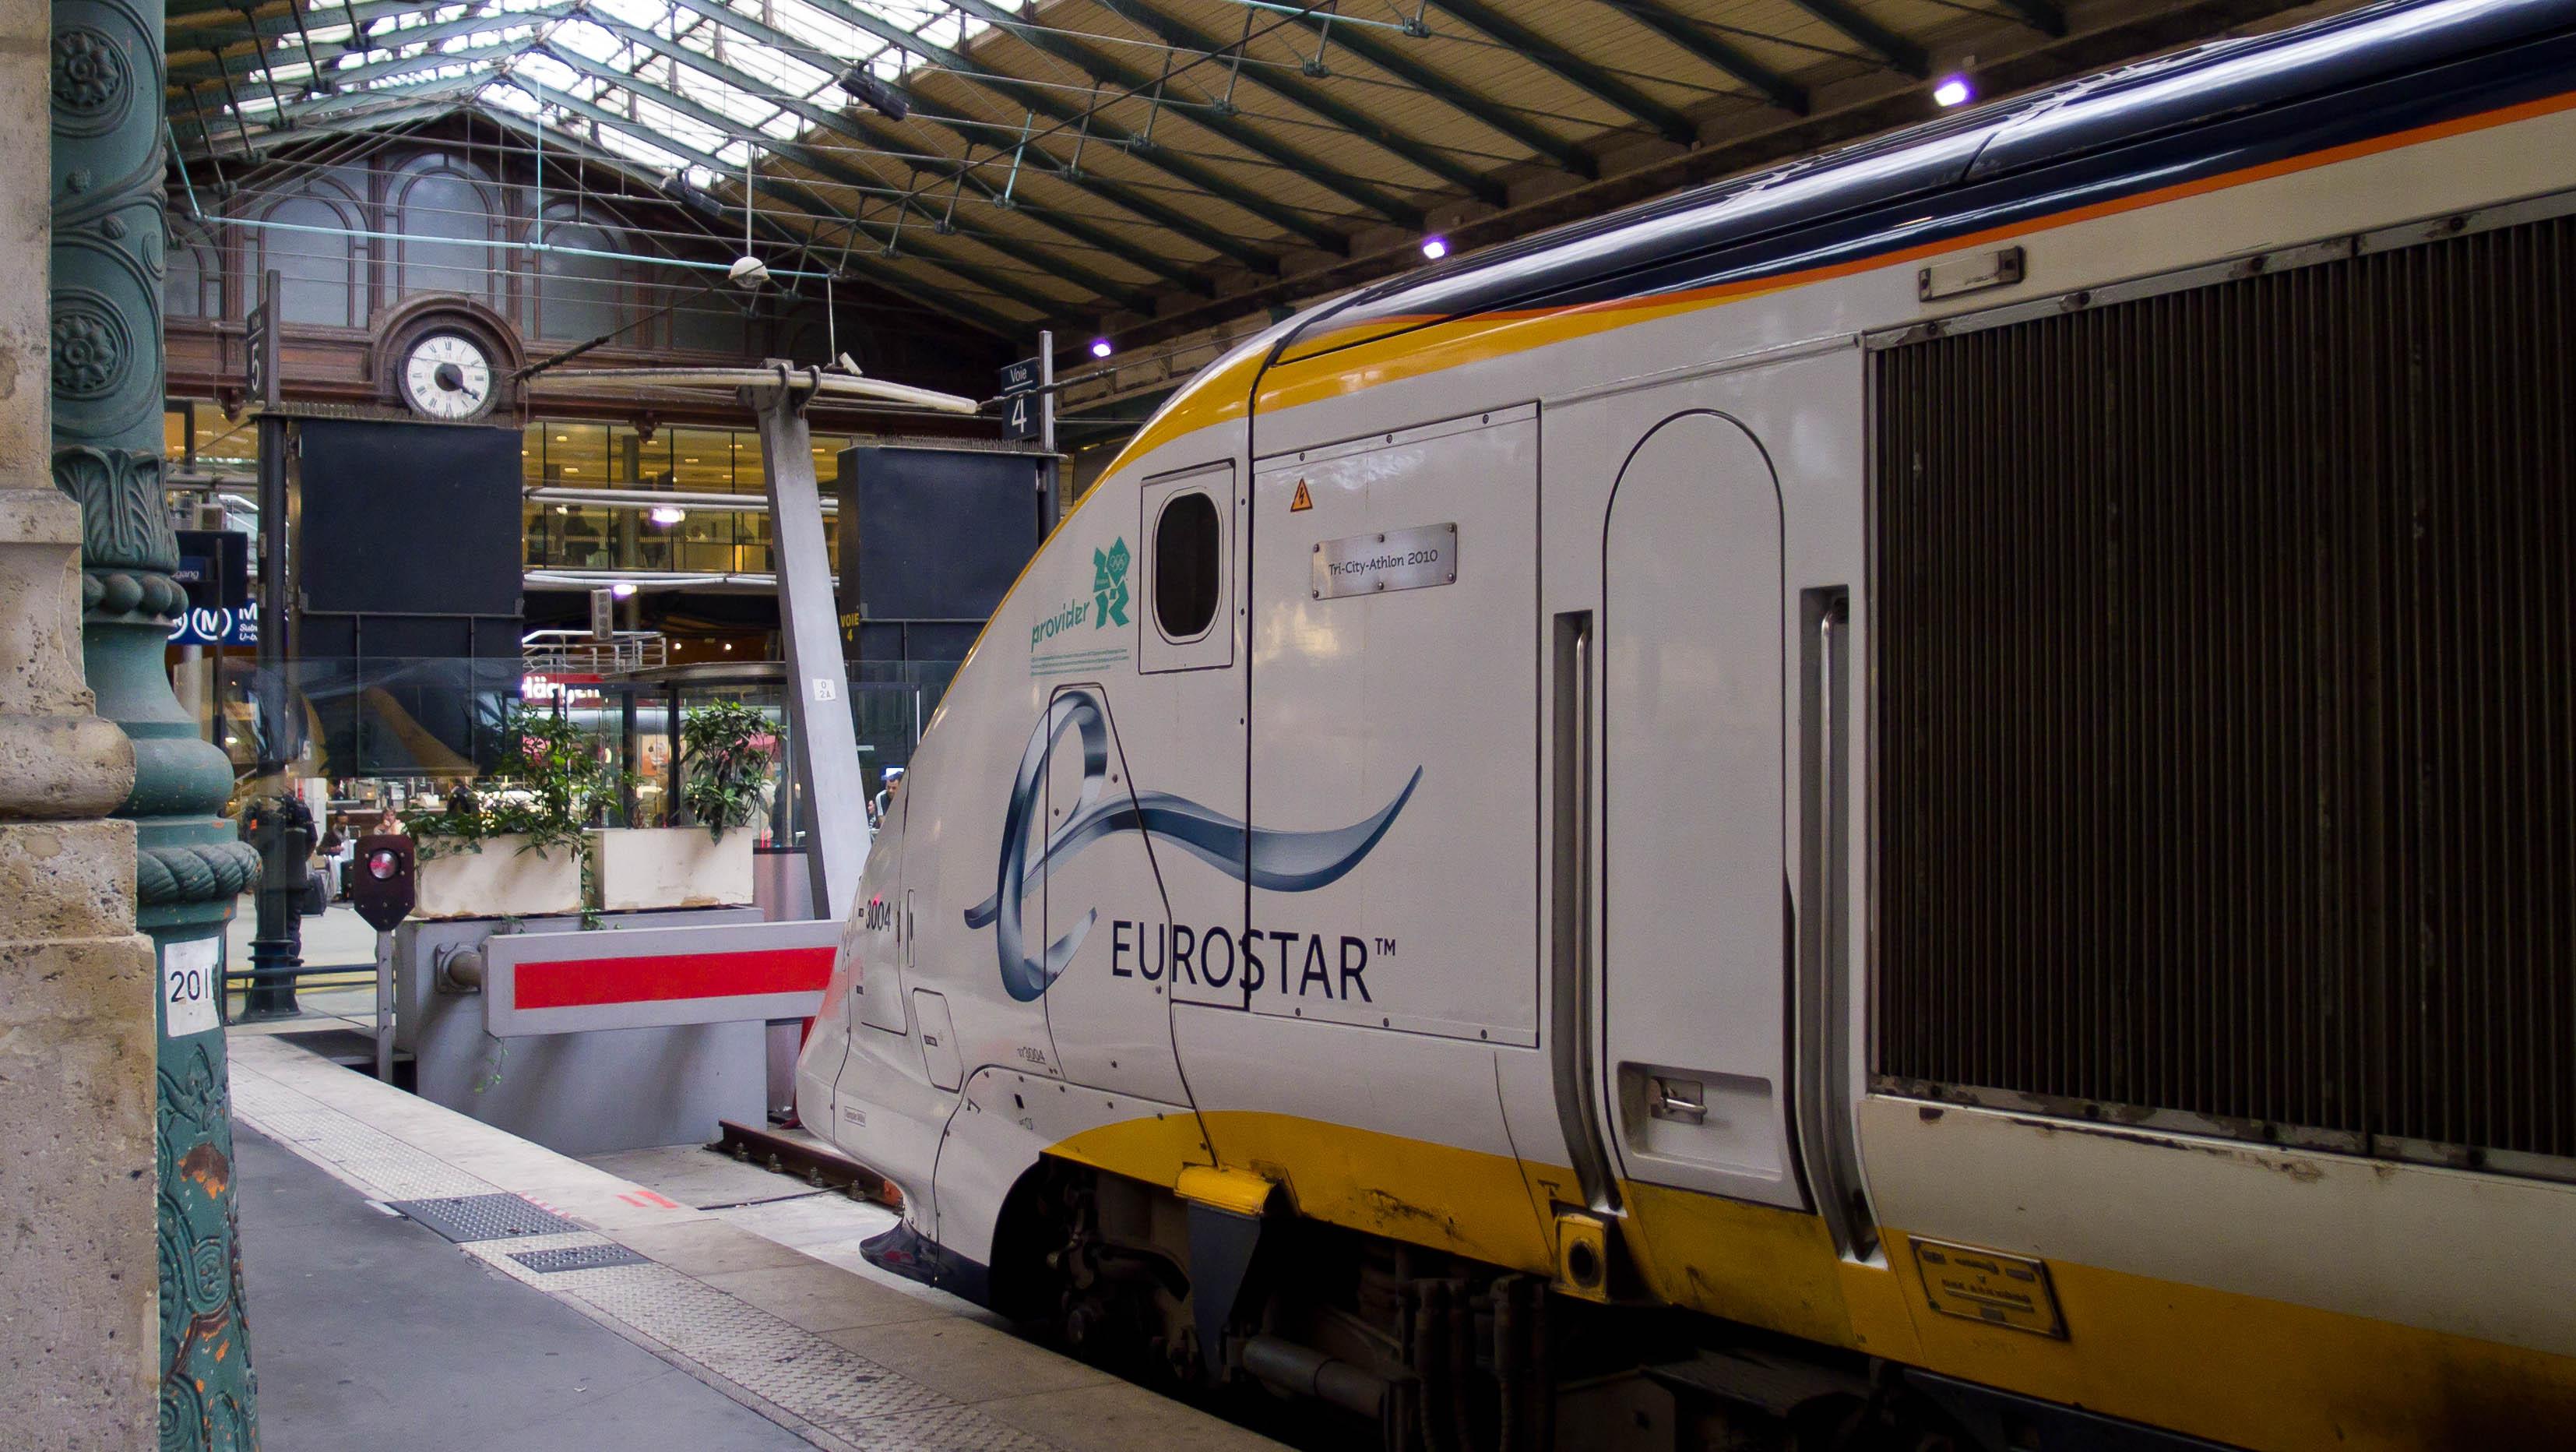 Gare du nord eurostar for Gare du nord paris